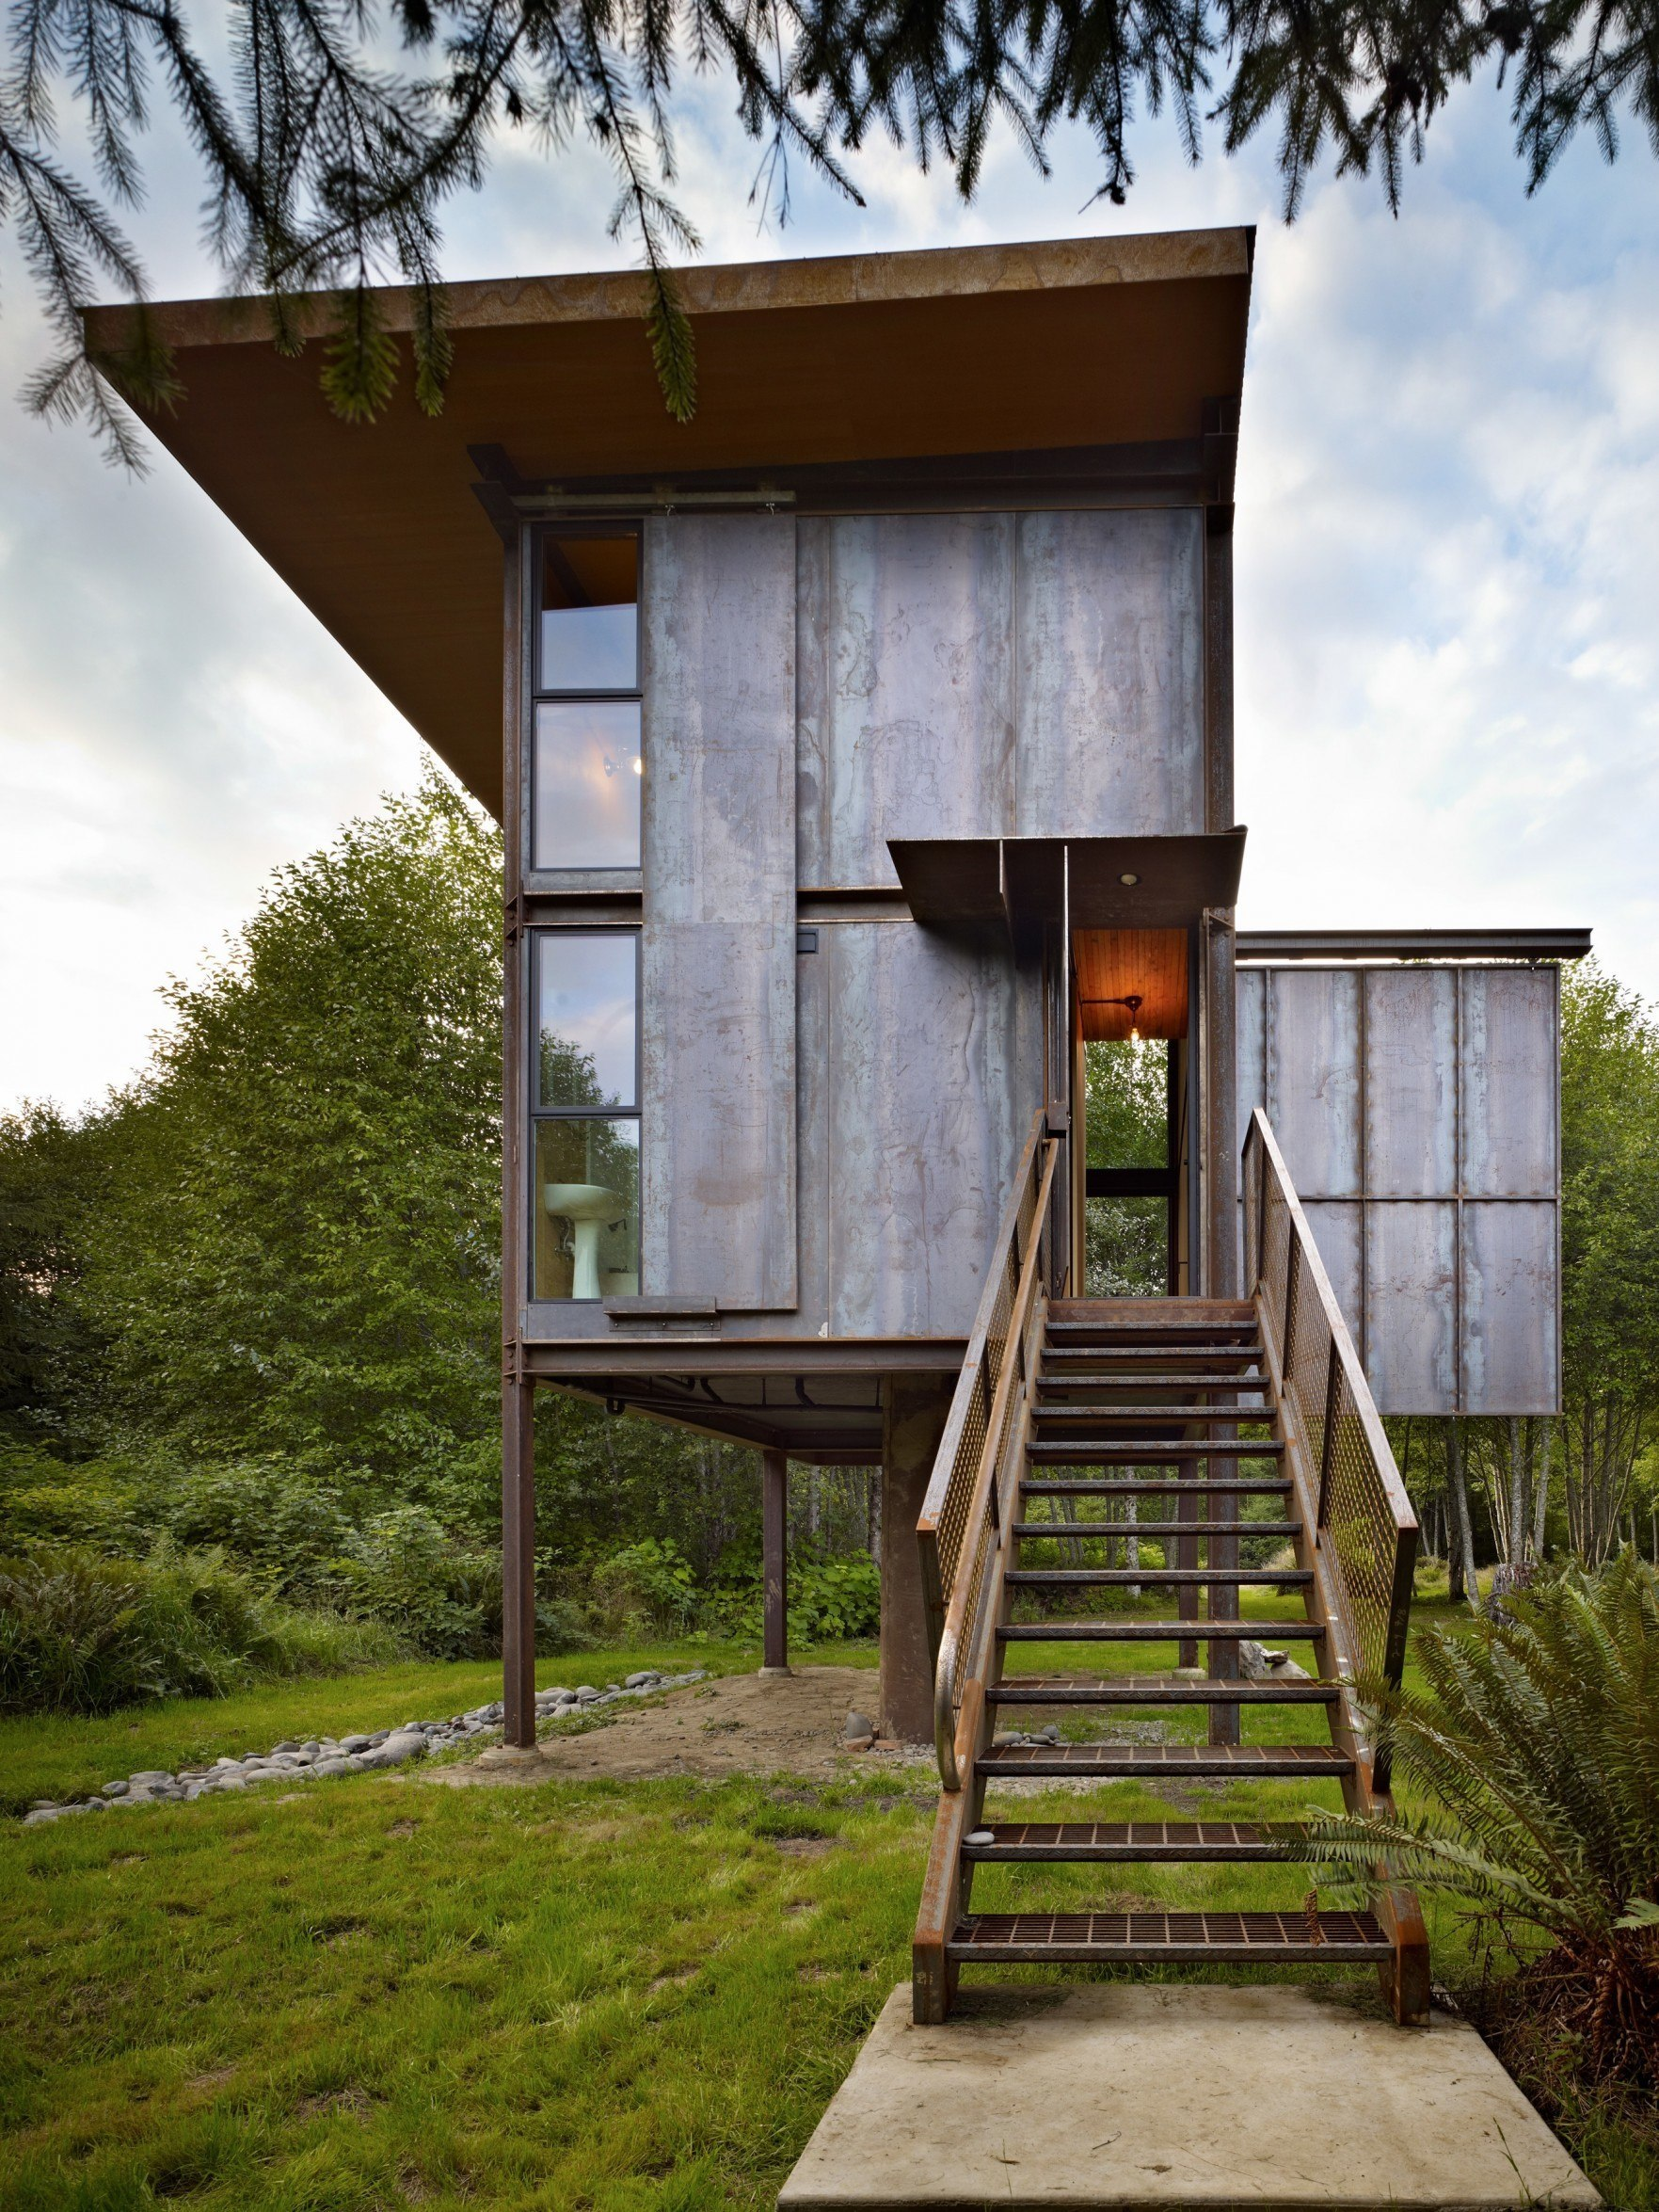 sol-duc-cabin-cabane-peche-Olson Kundig-3